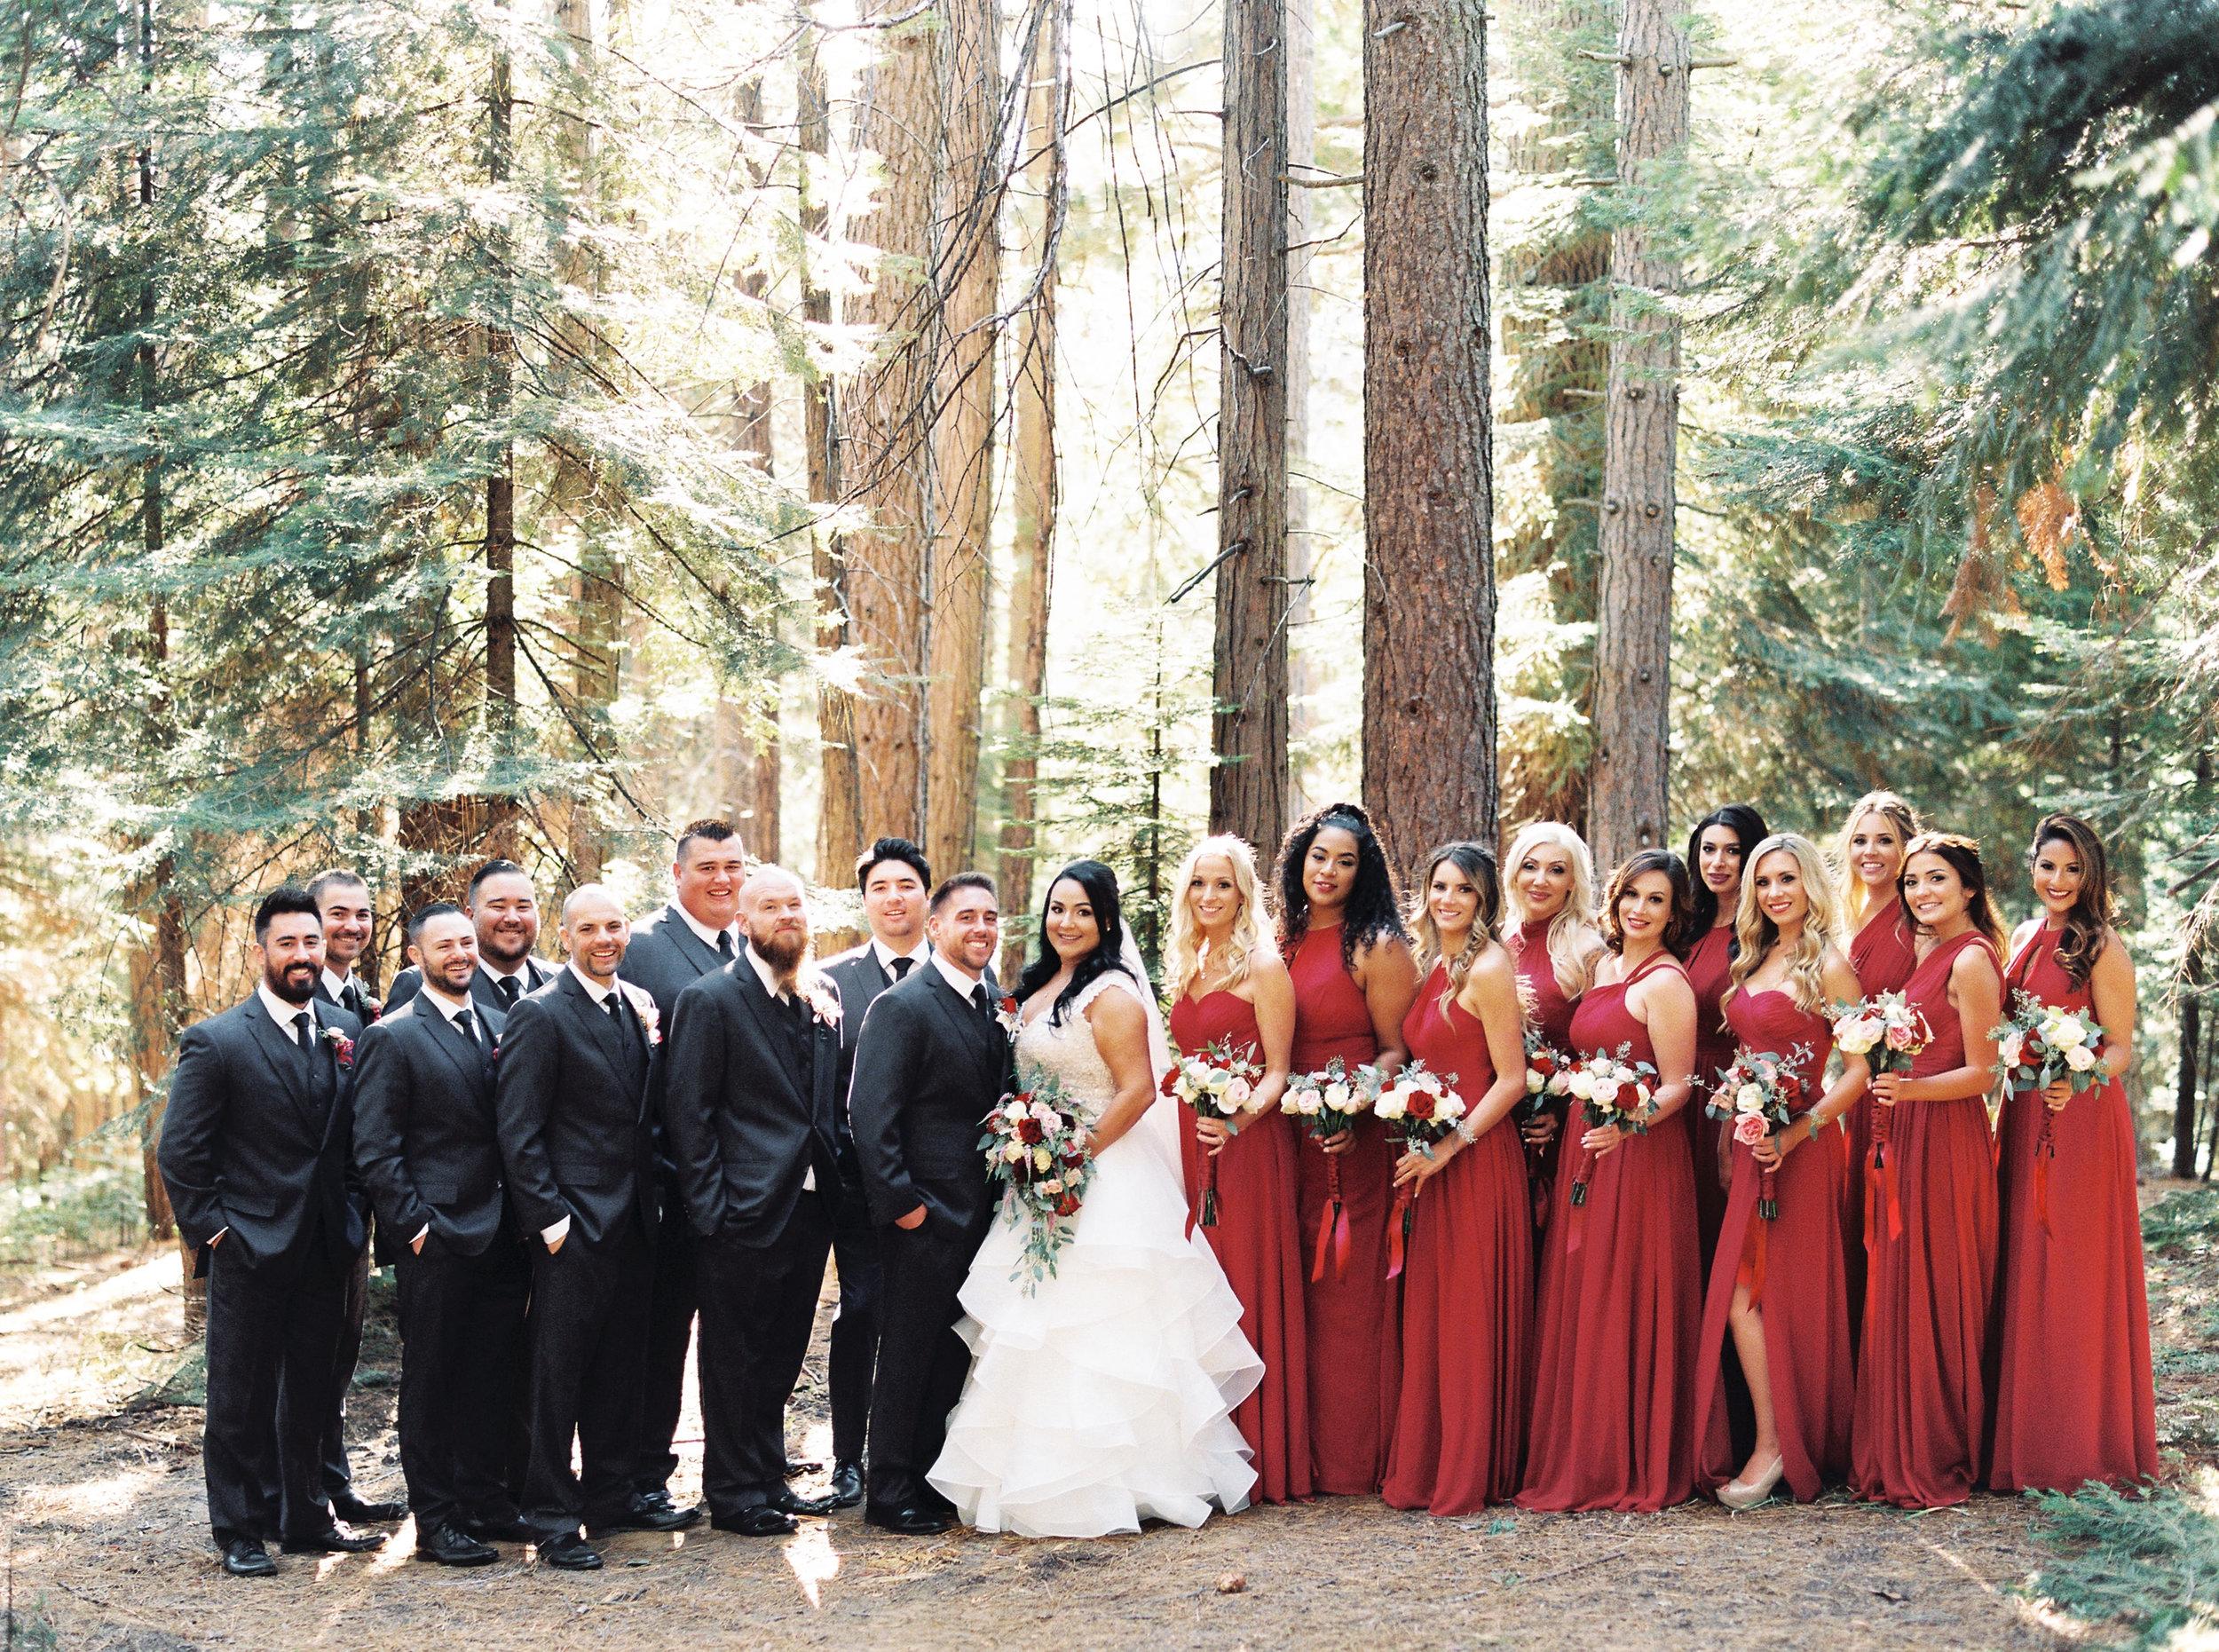 Tenaya-lodge-wedding-at-yosemite-national-park-california-93.jpg